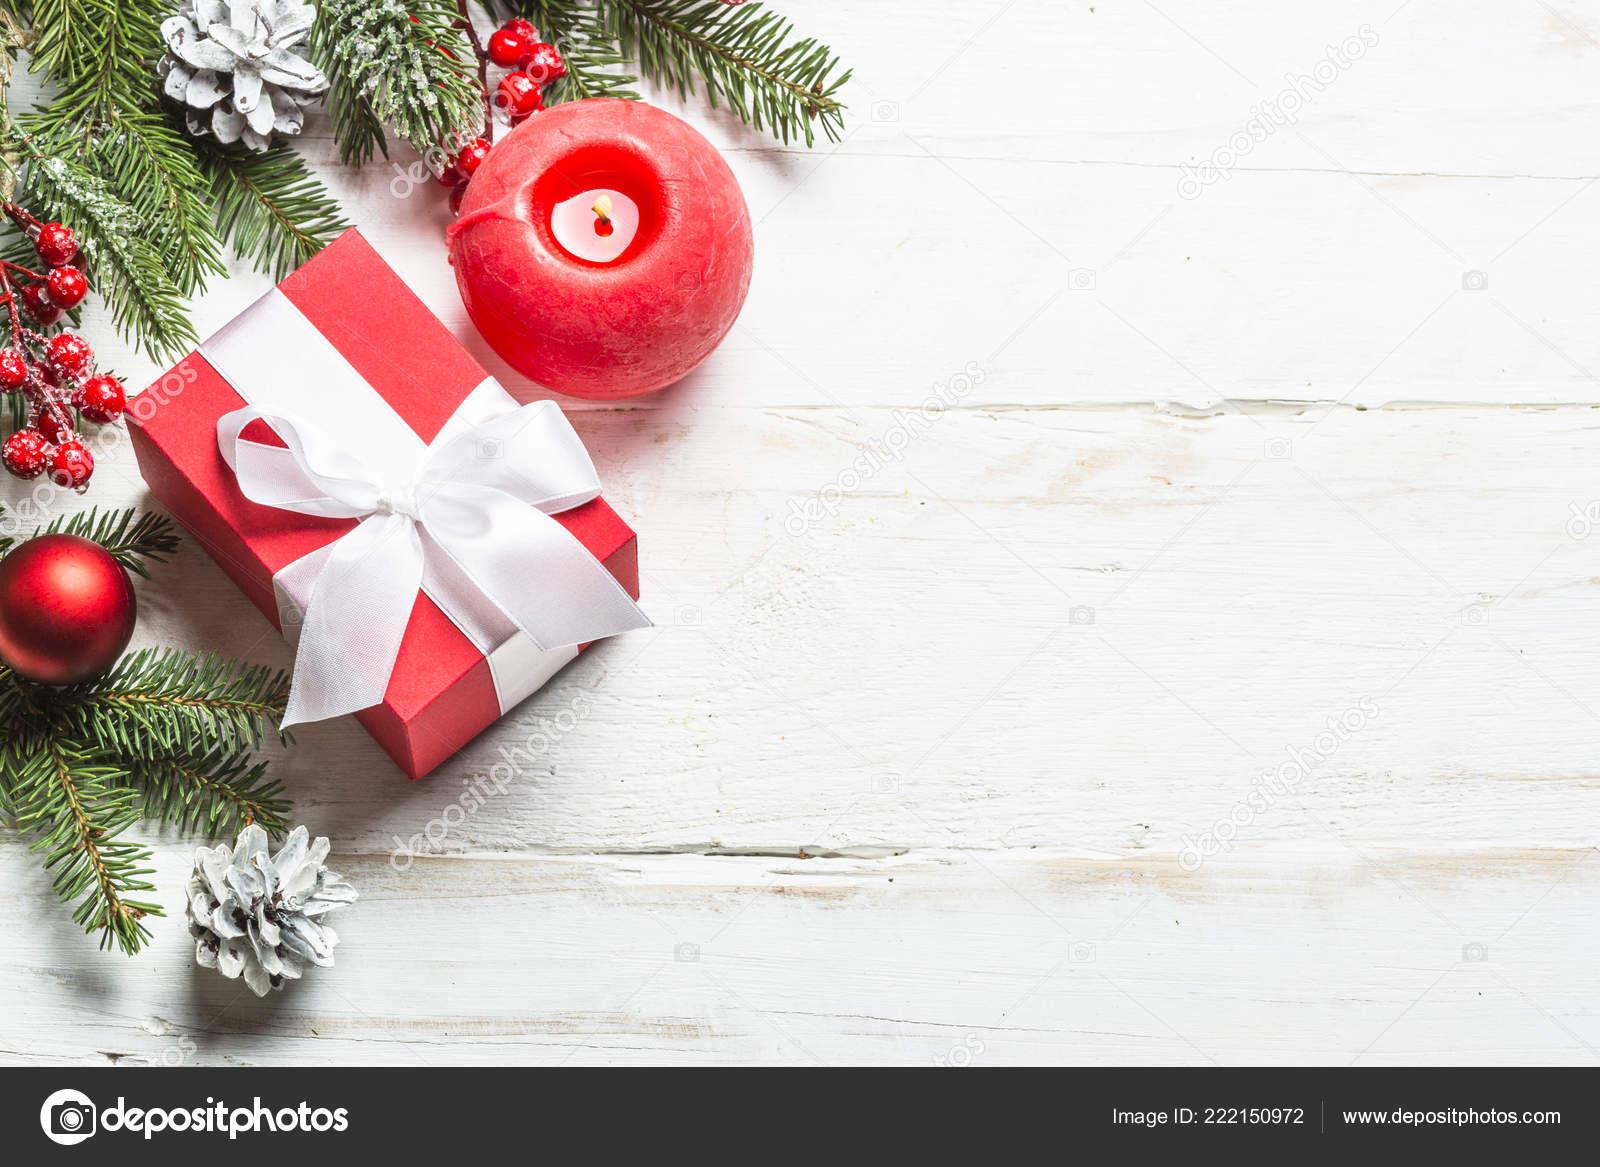 Christmas Background Pic.Christmas Background With Fir Tree Present Box And